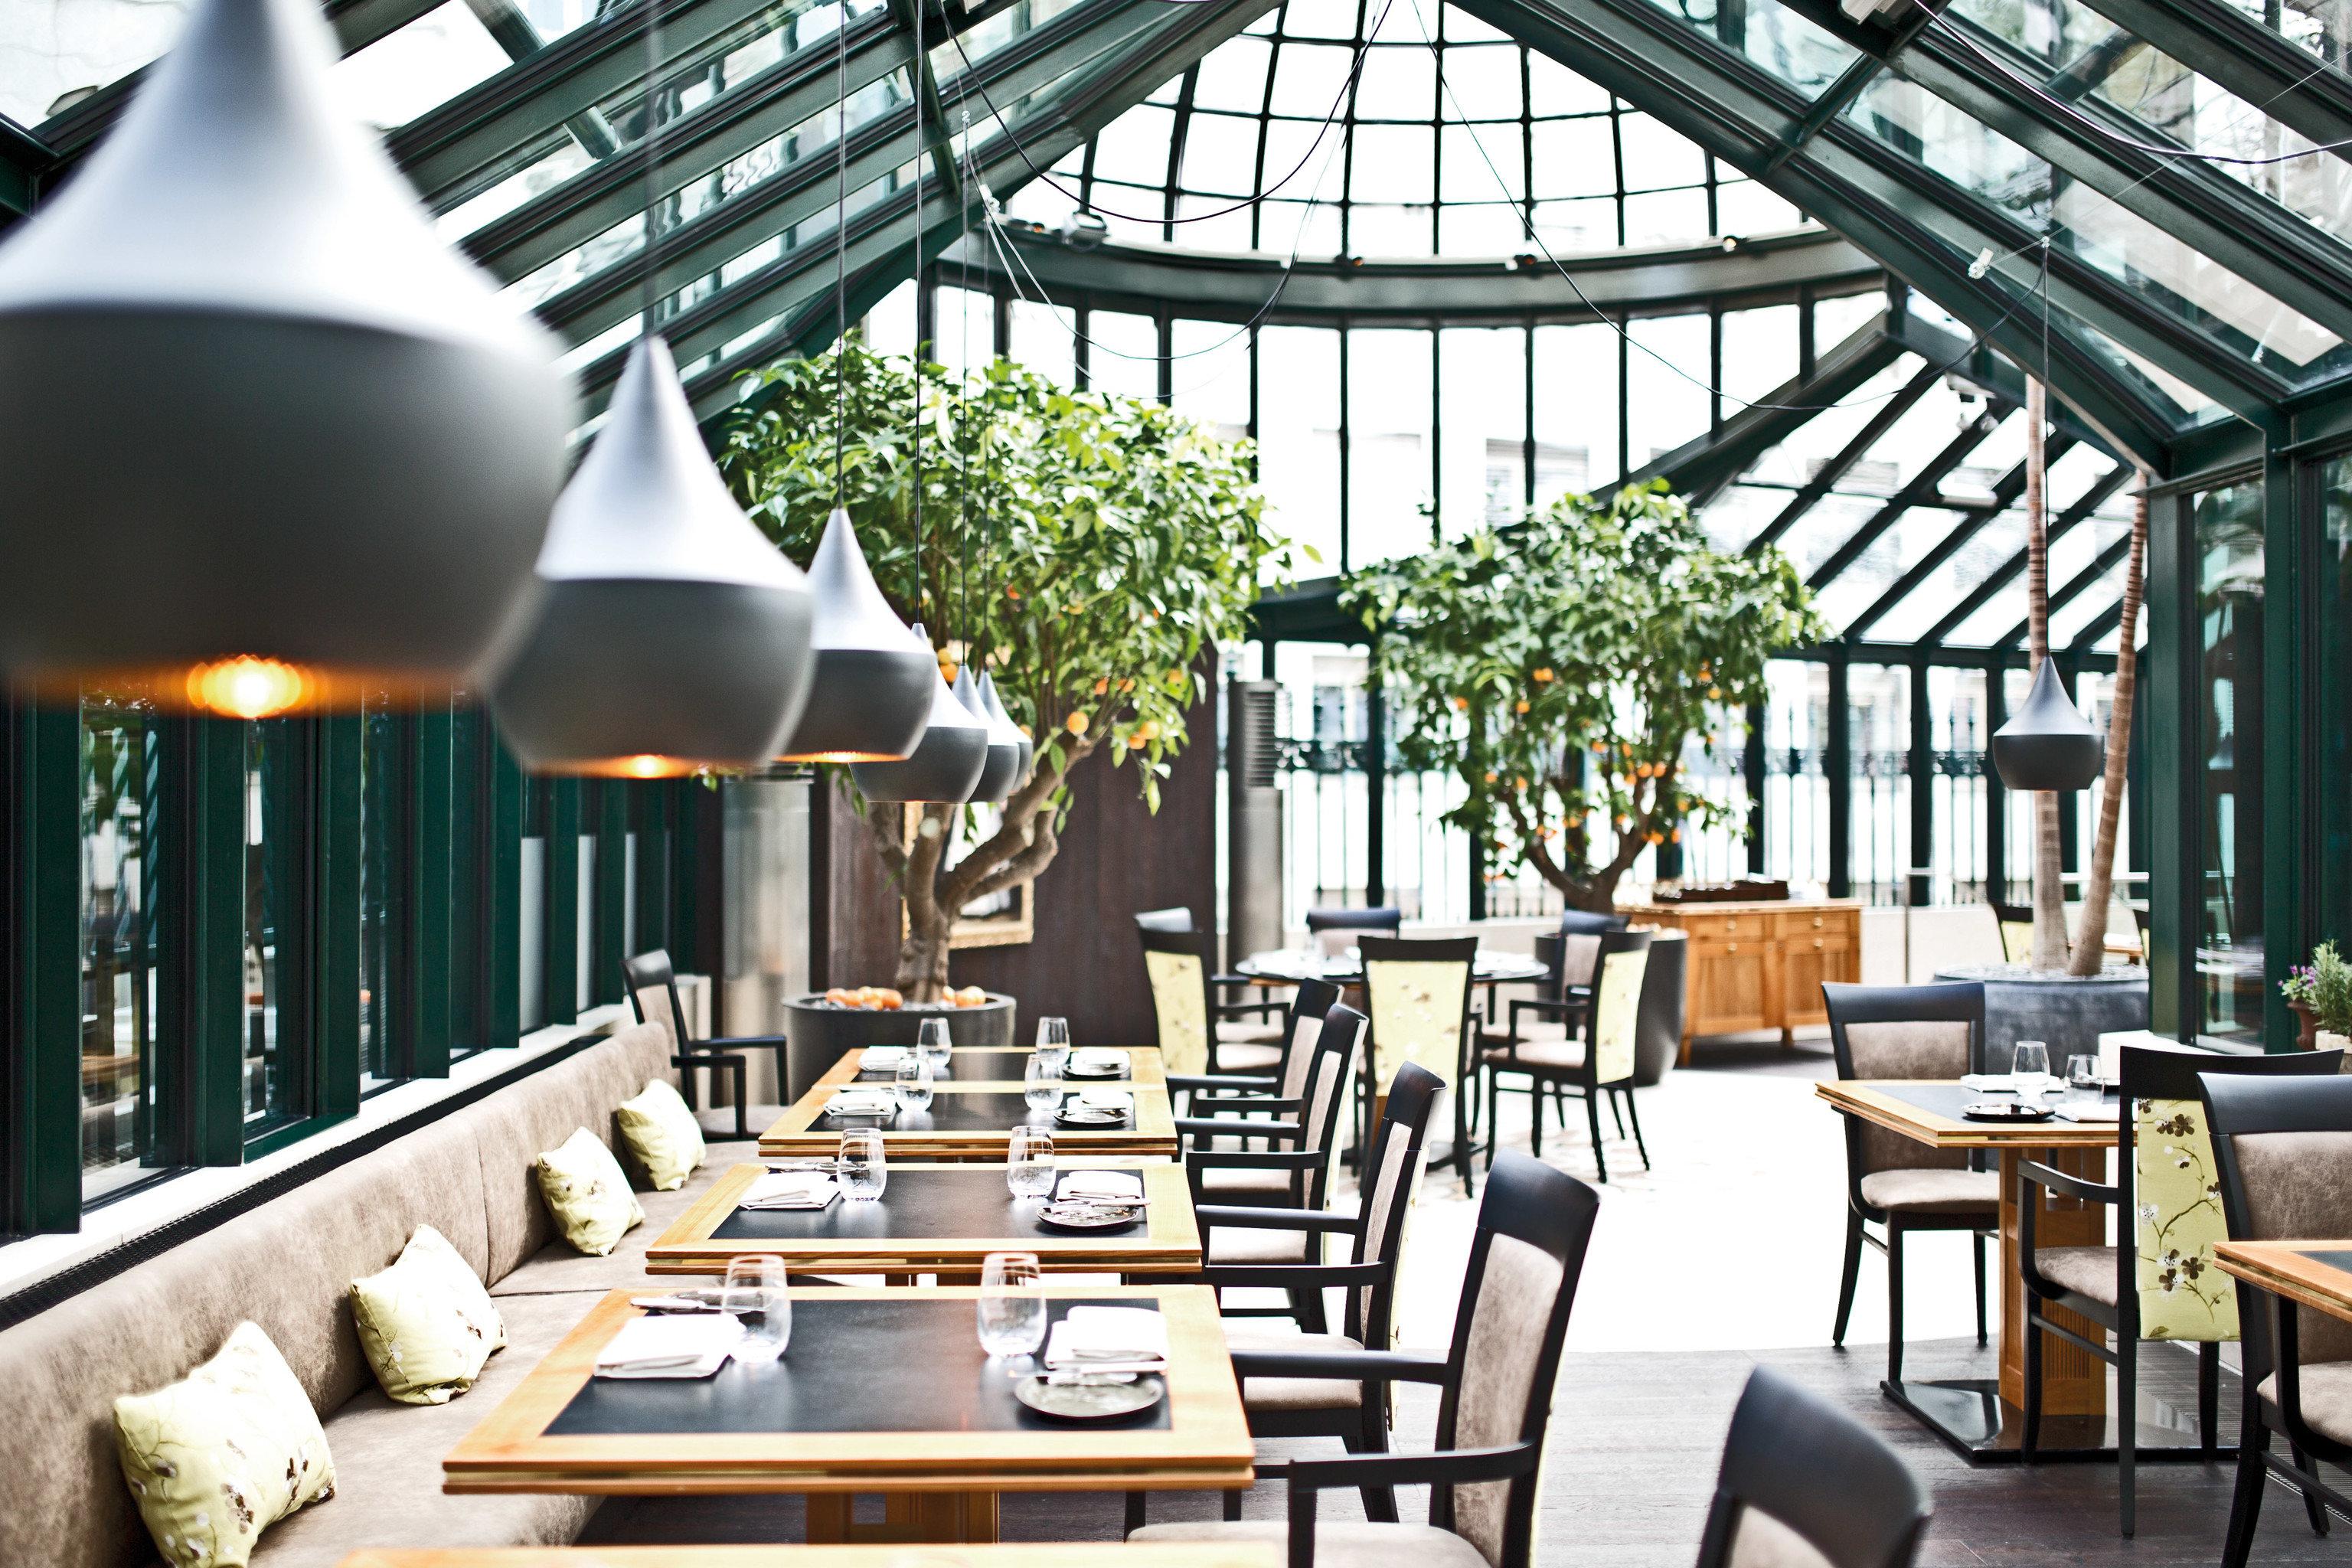 chair Dining restaurant orangery outdoor structure